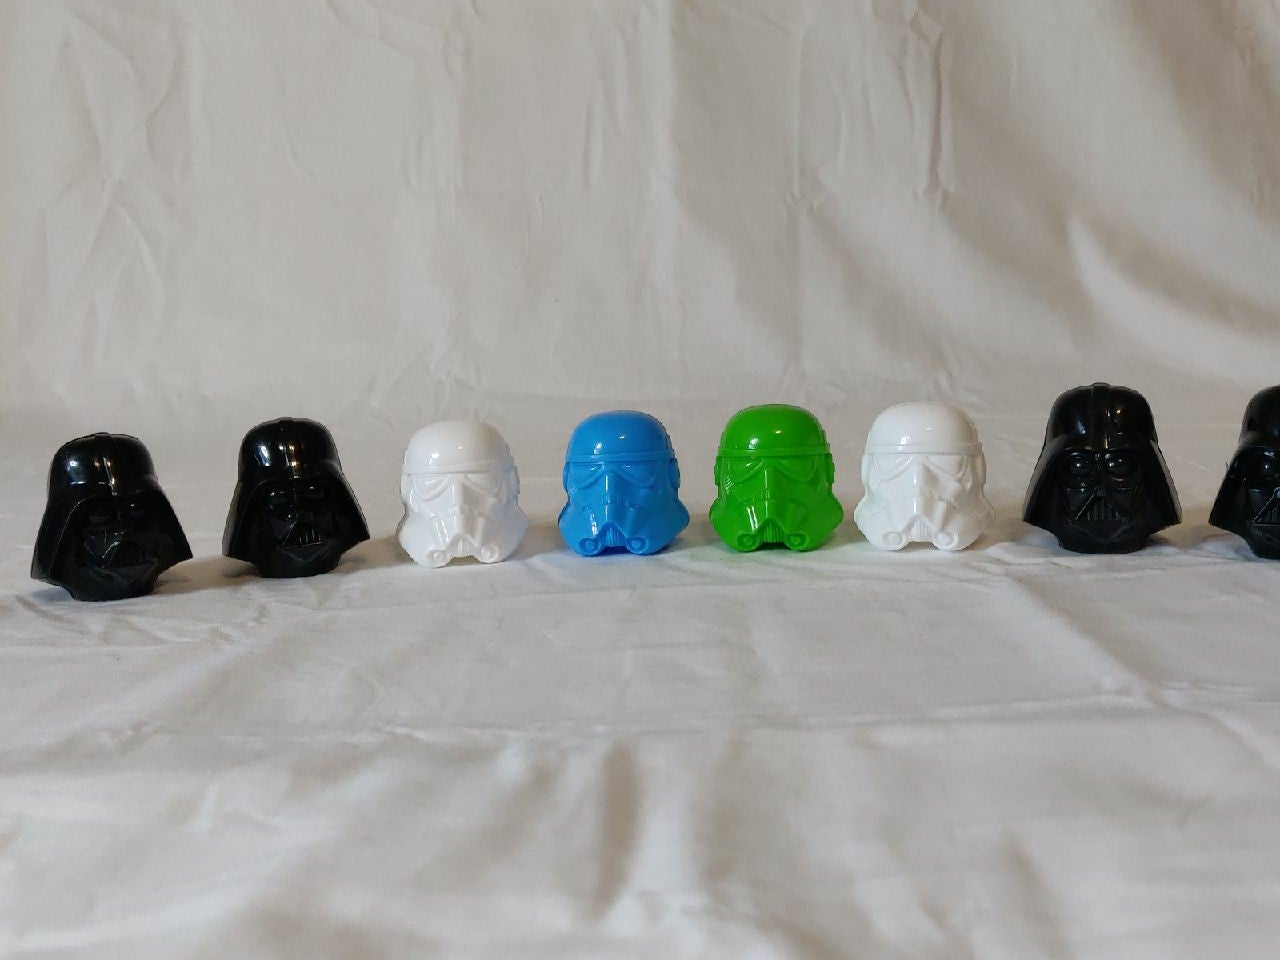 Star Wars Treat Holders; Lot of 8